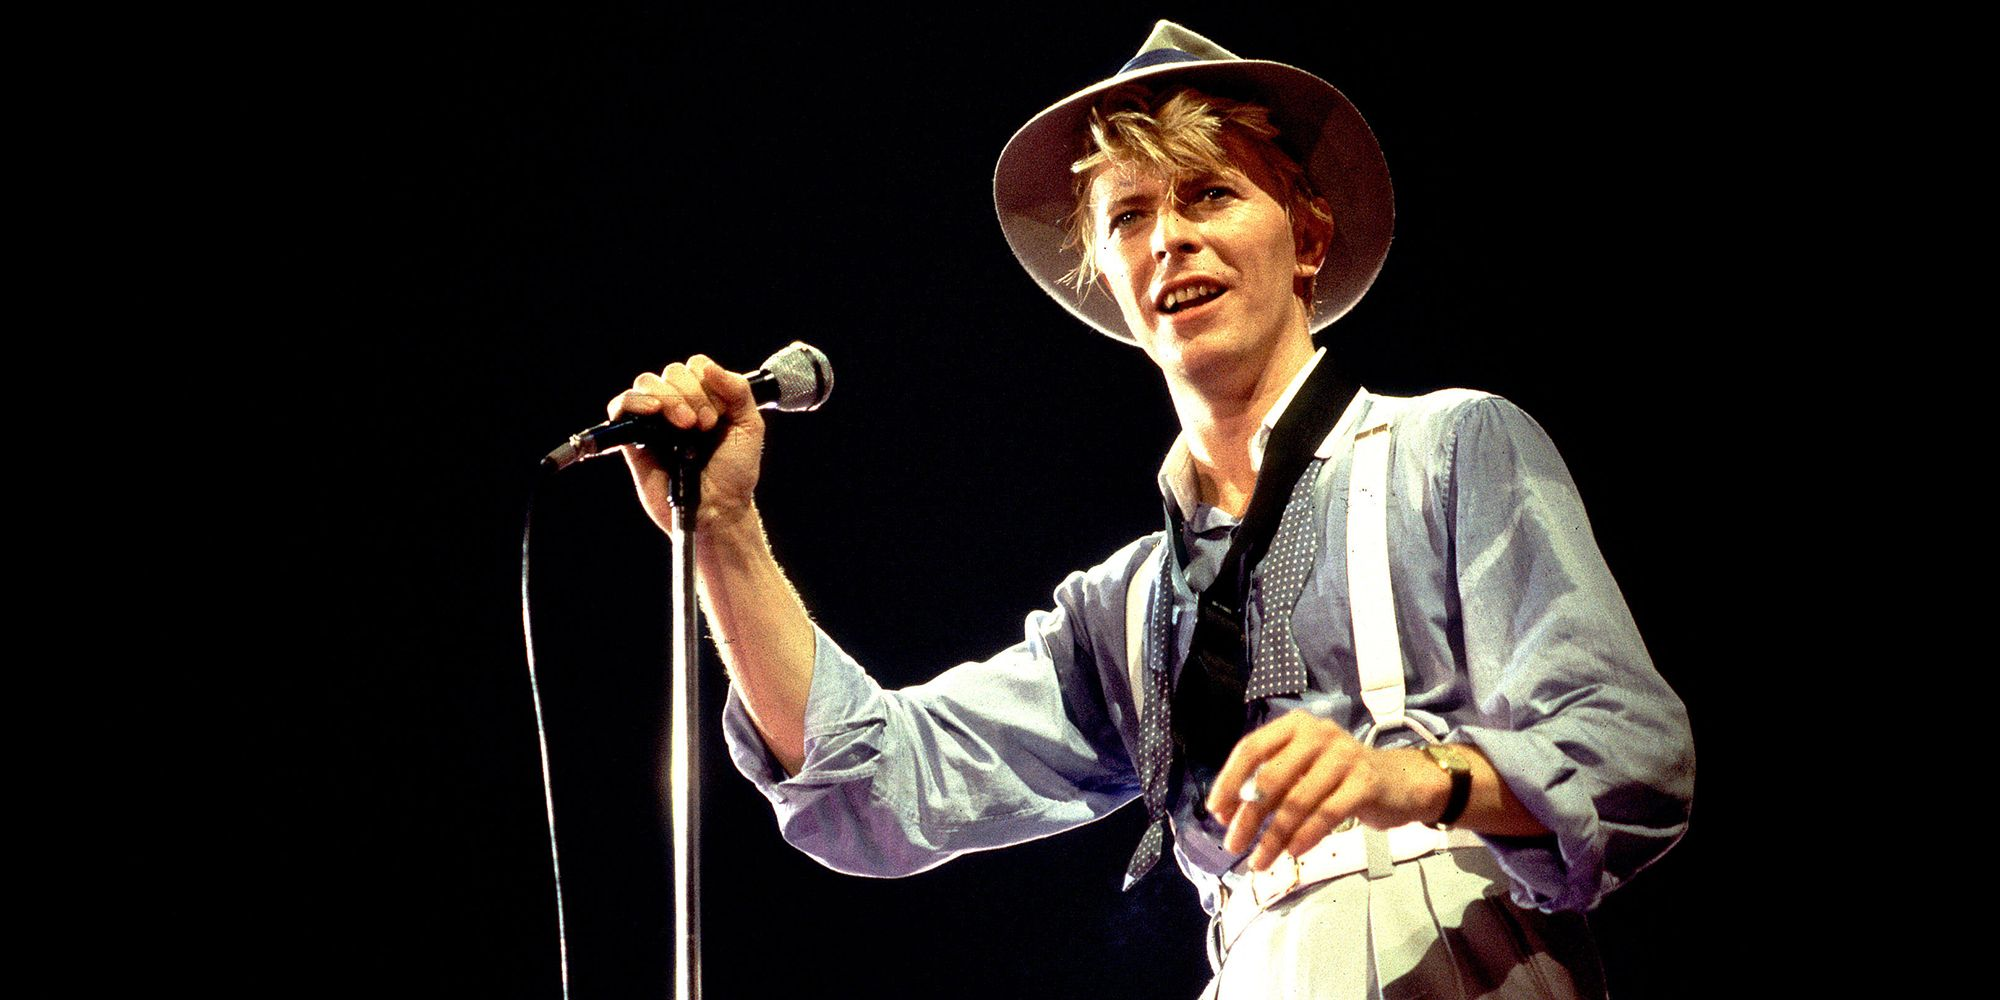 Segreti Di David A 10 Rubare Da Bowie Stile qZxndH